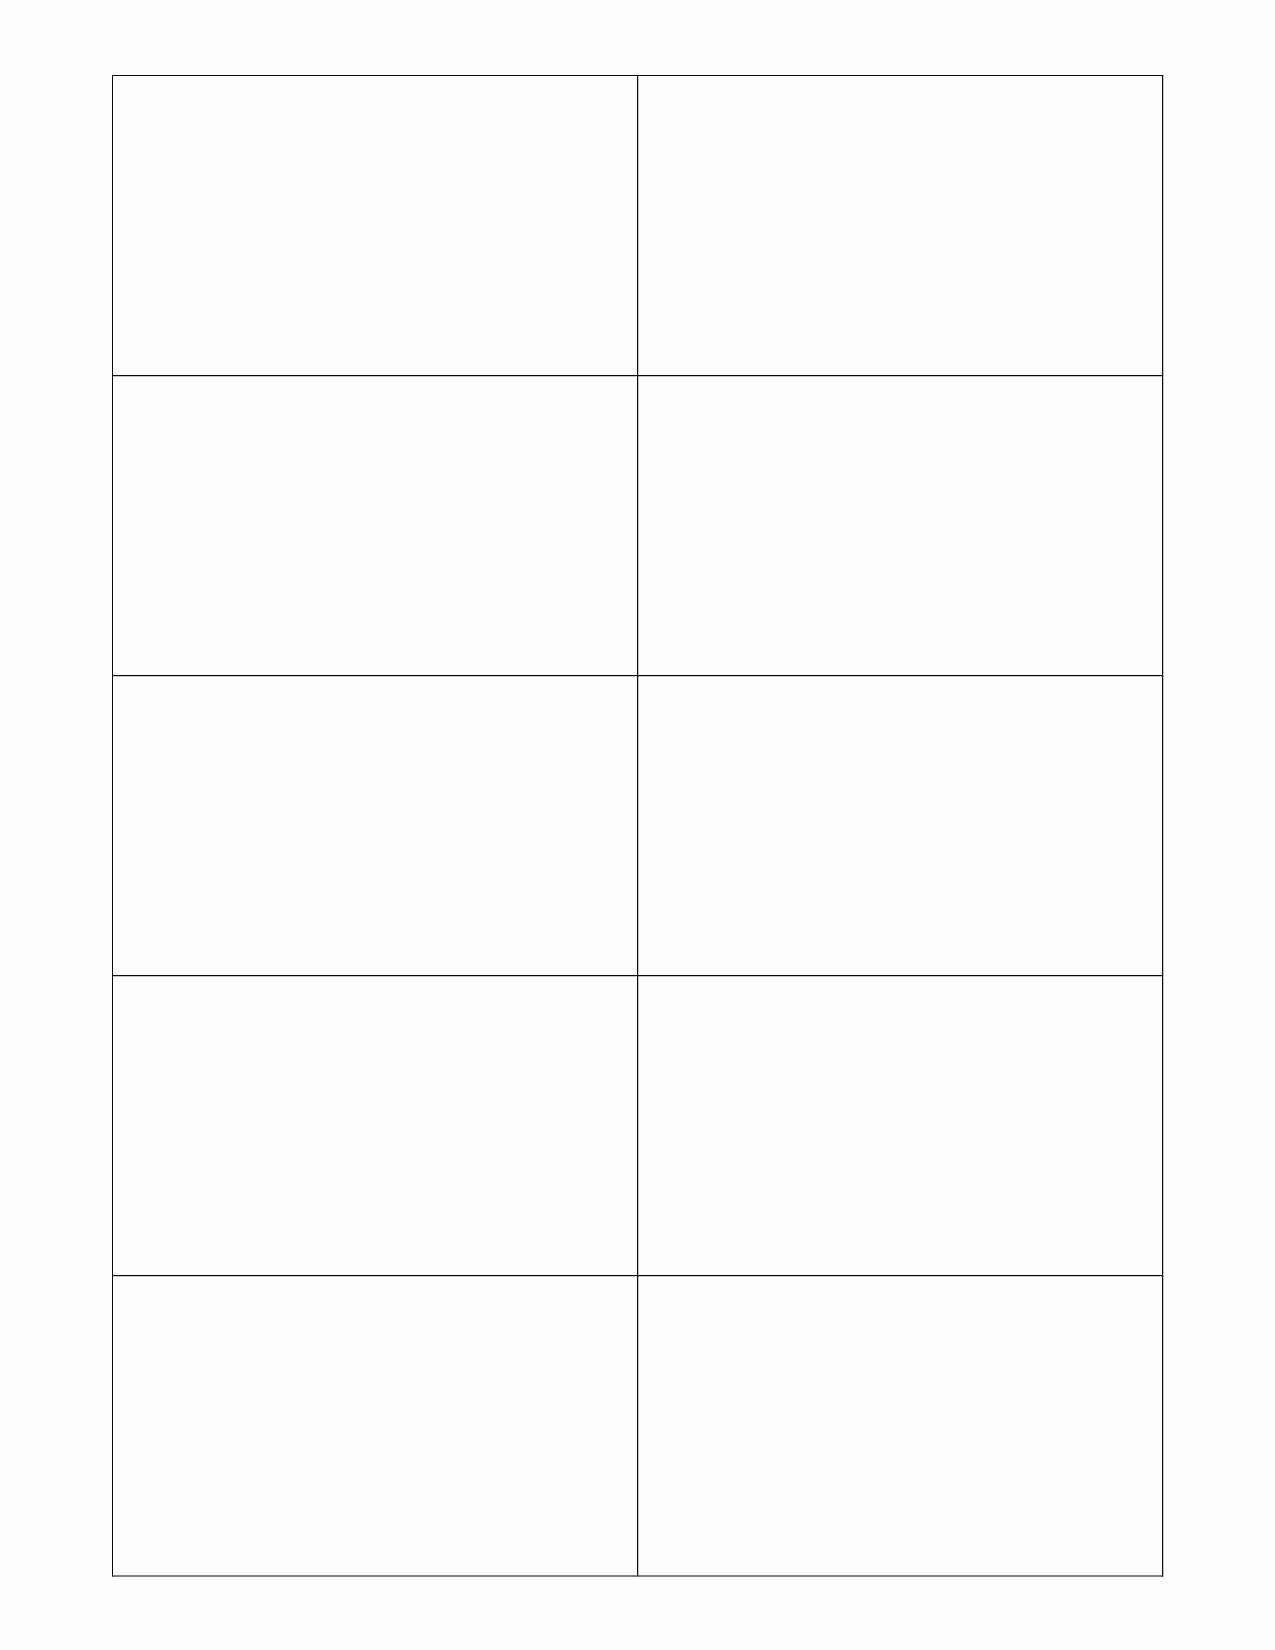 Microsoft Word 4x6 Postcard Template Elegant Luxury 4x6 Index Card Tem Free Business Card Templates Business Card Template Photoshop Business Card Template Psd